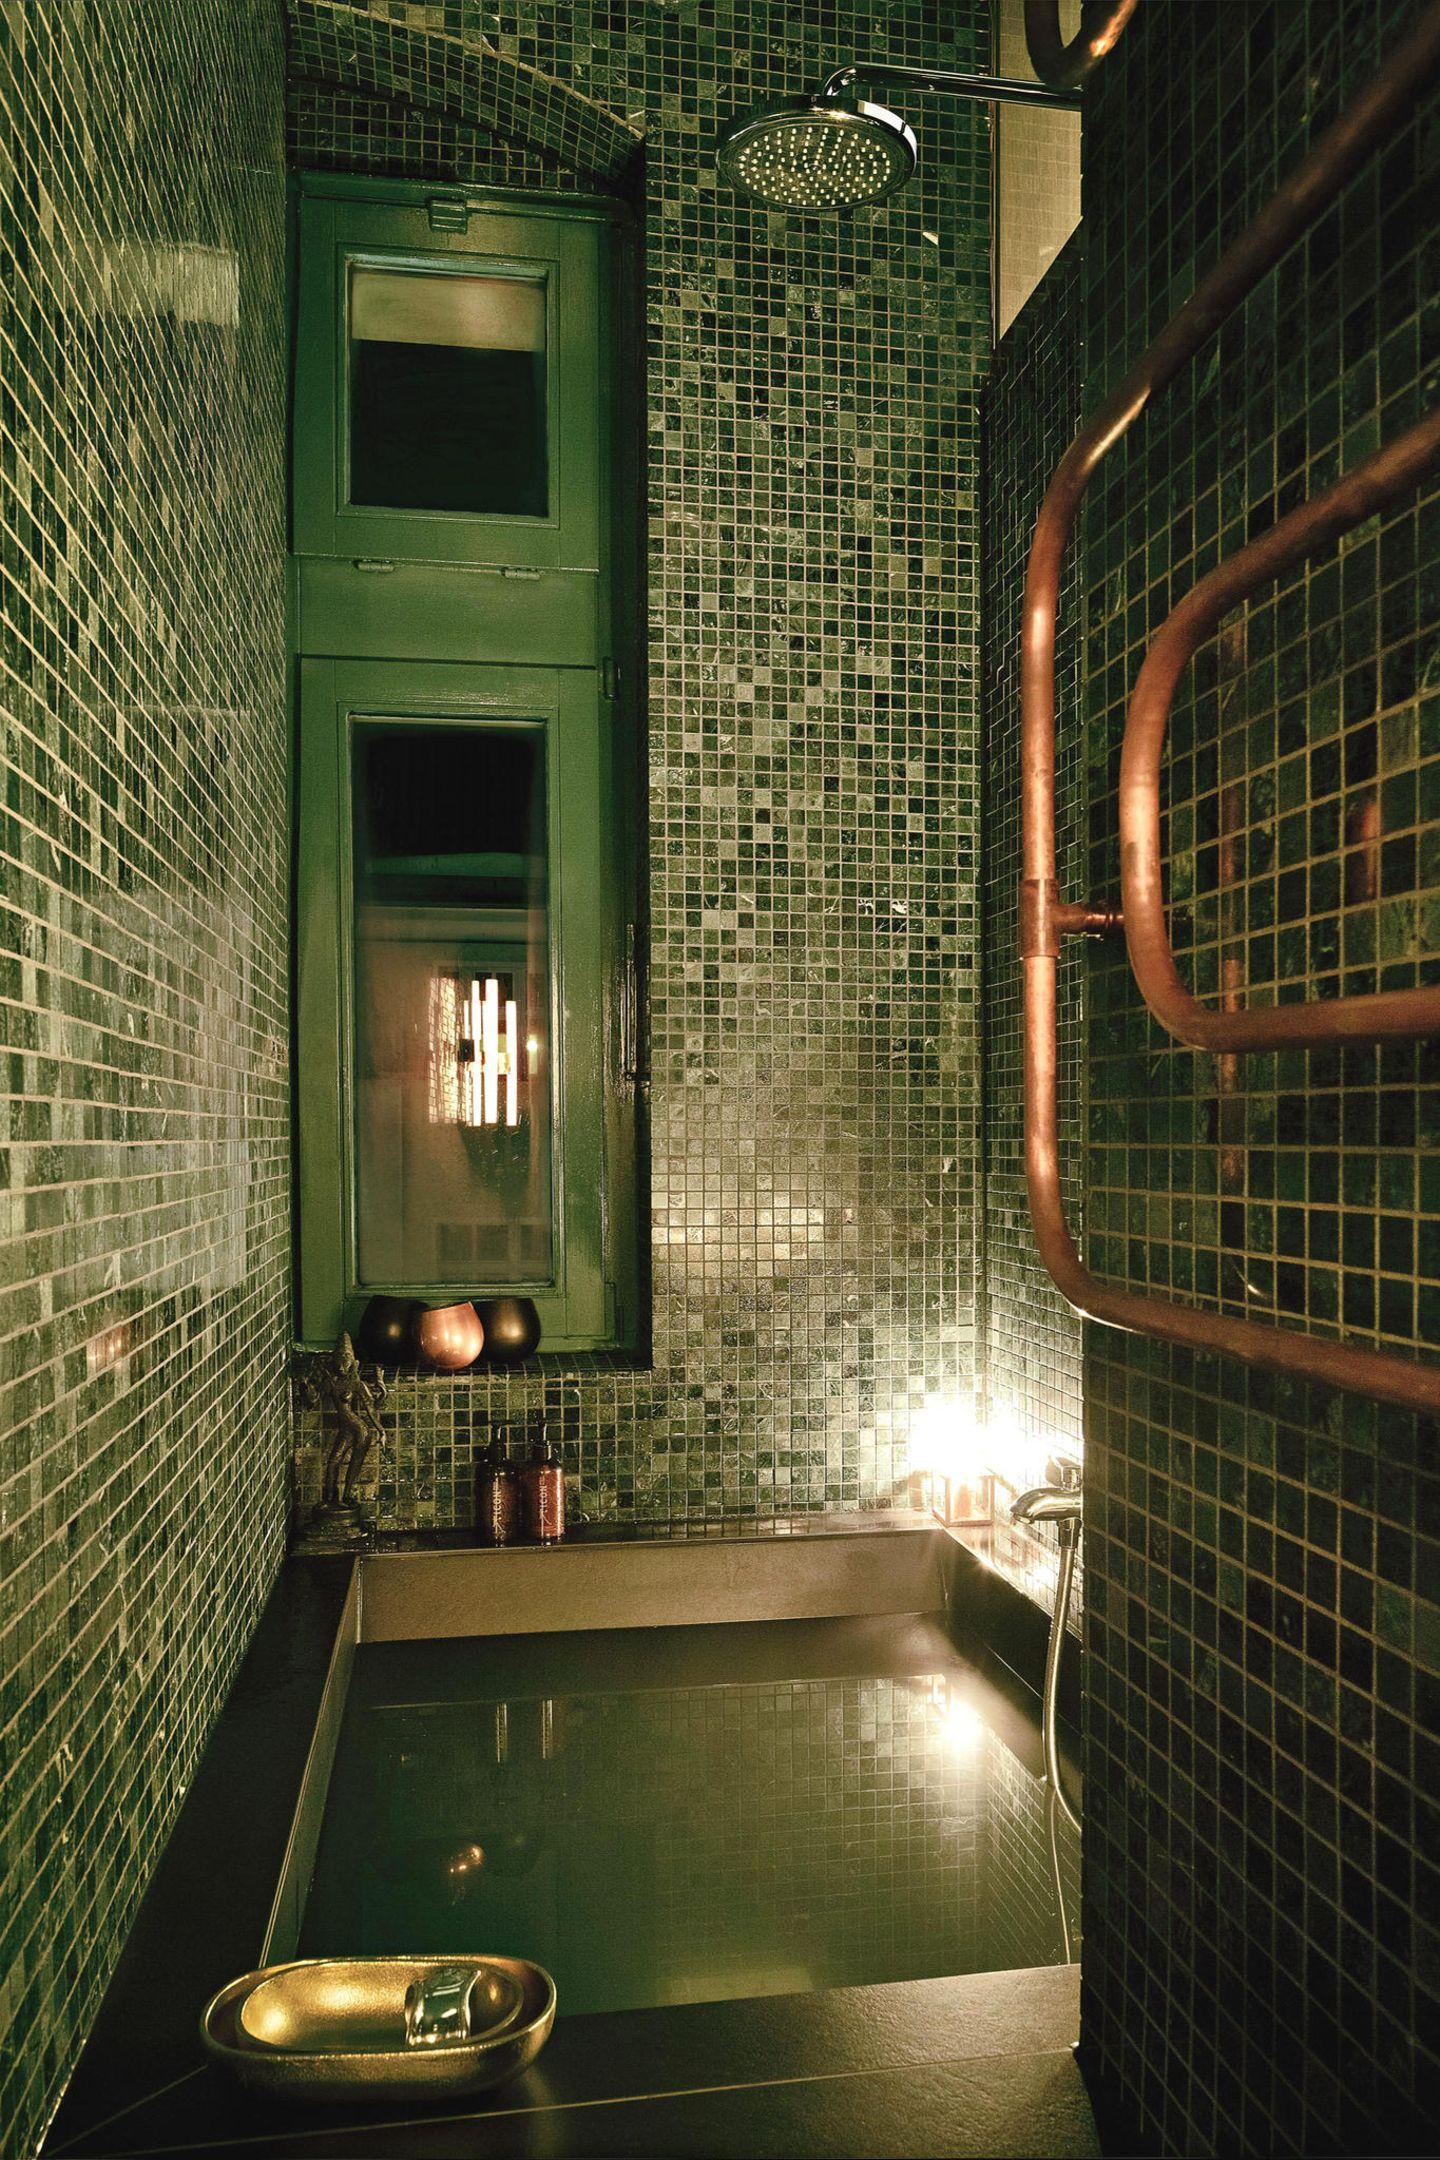 Luxuriöses, kleines Bad